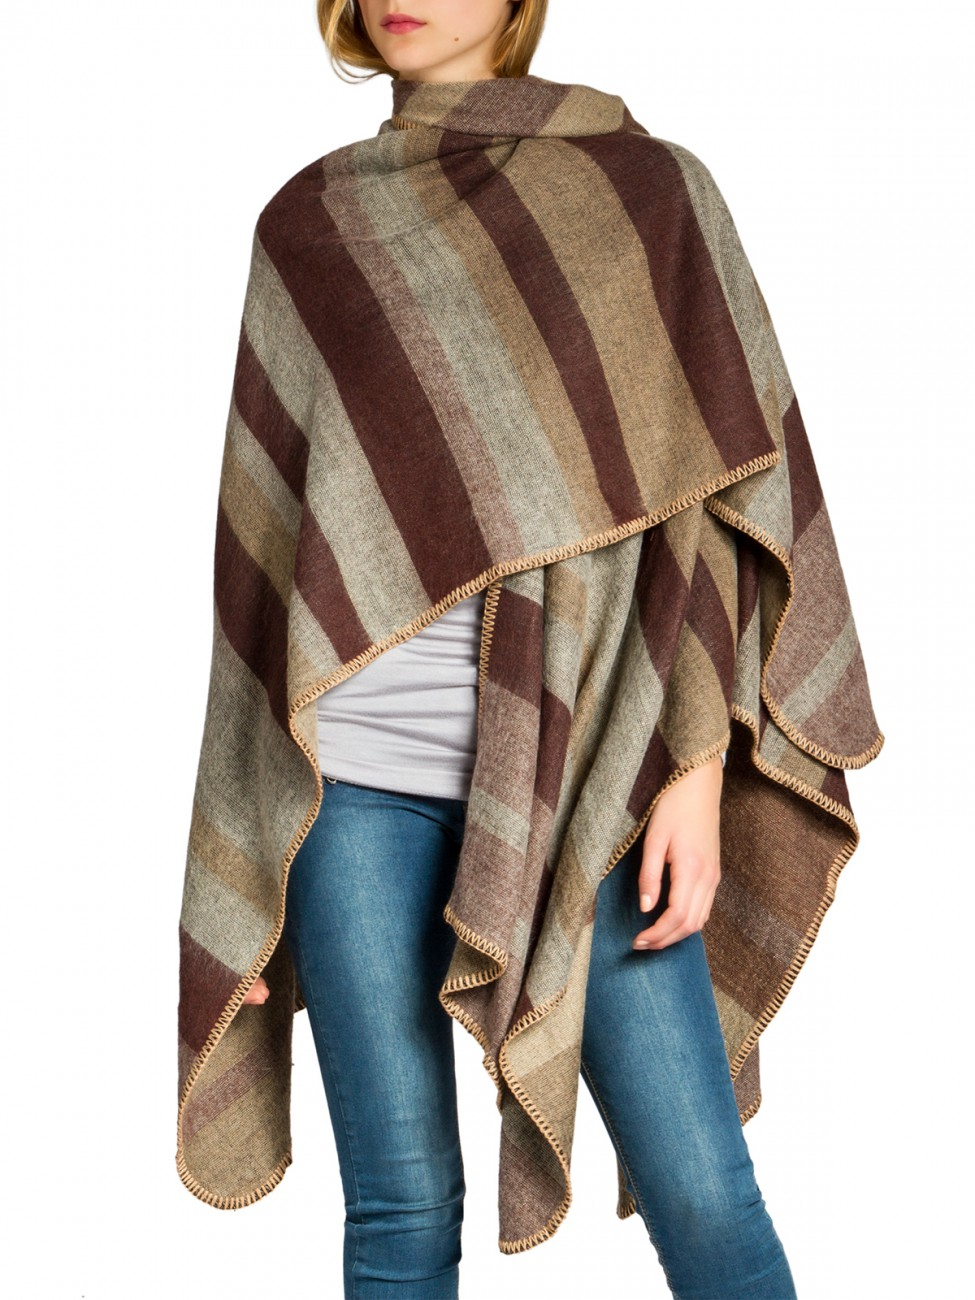 caspar damen woll poncho warm strick winter cape xxl schal. Black Bedroom Furniture Sets. Home Design Ideas